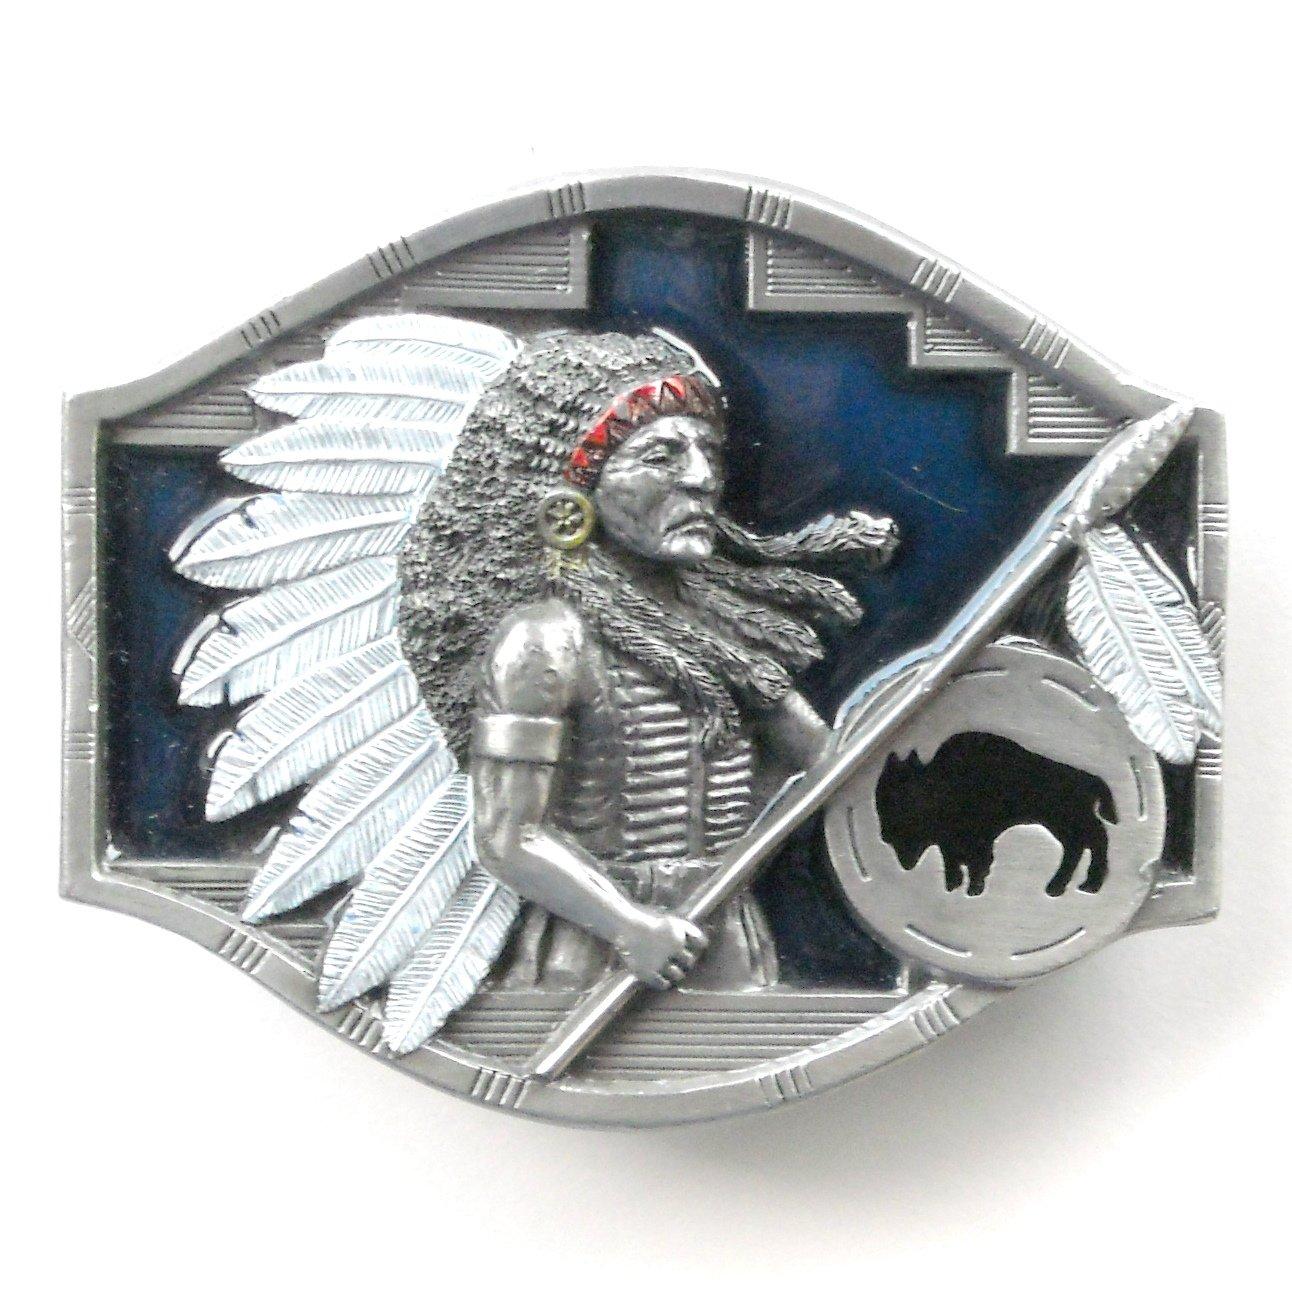 Native American Indian Chief Vintage 3D Arroyo Grande Pewter Belt Buckle